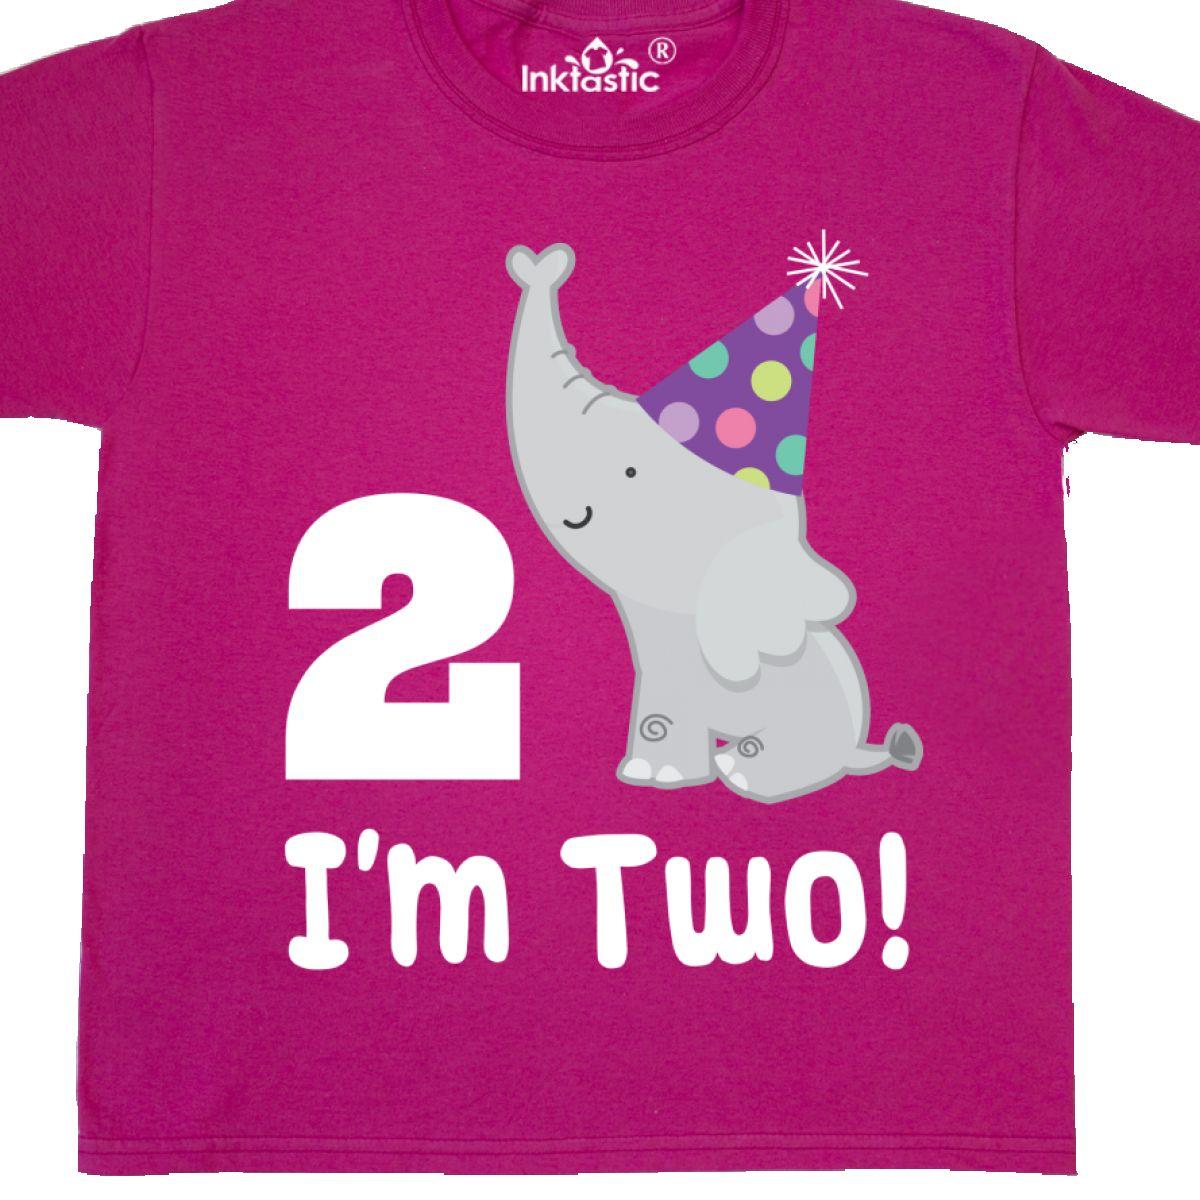 Inktastic Happy 2nd Birthday Zoo Elephant Youth T